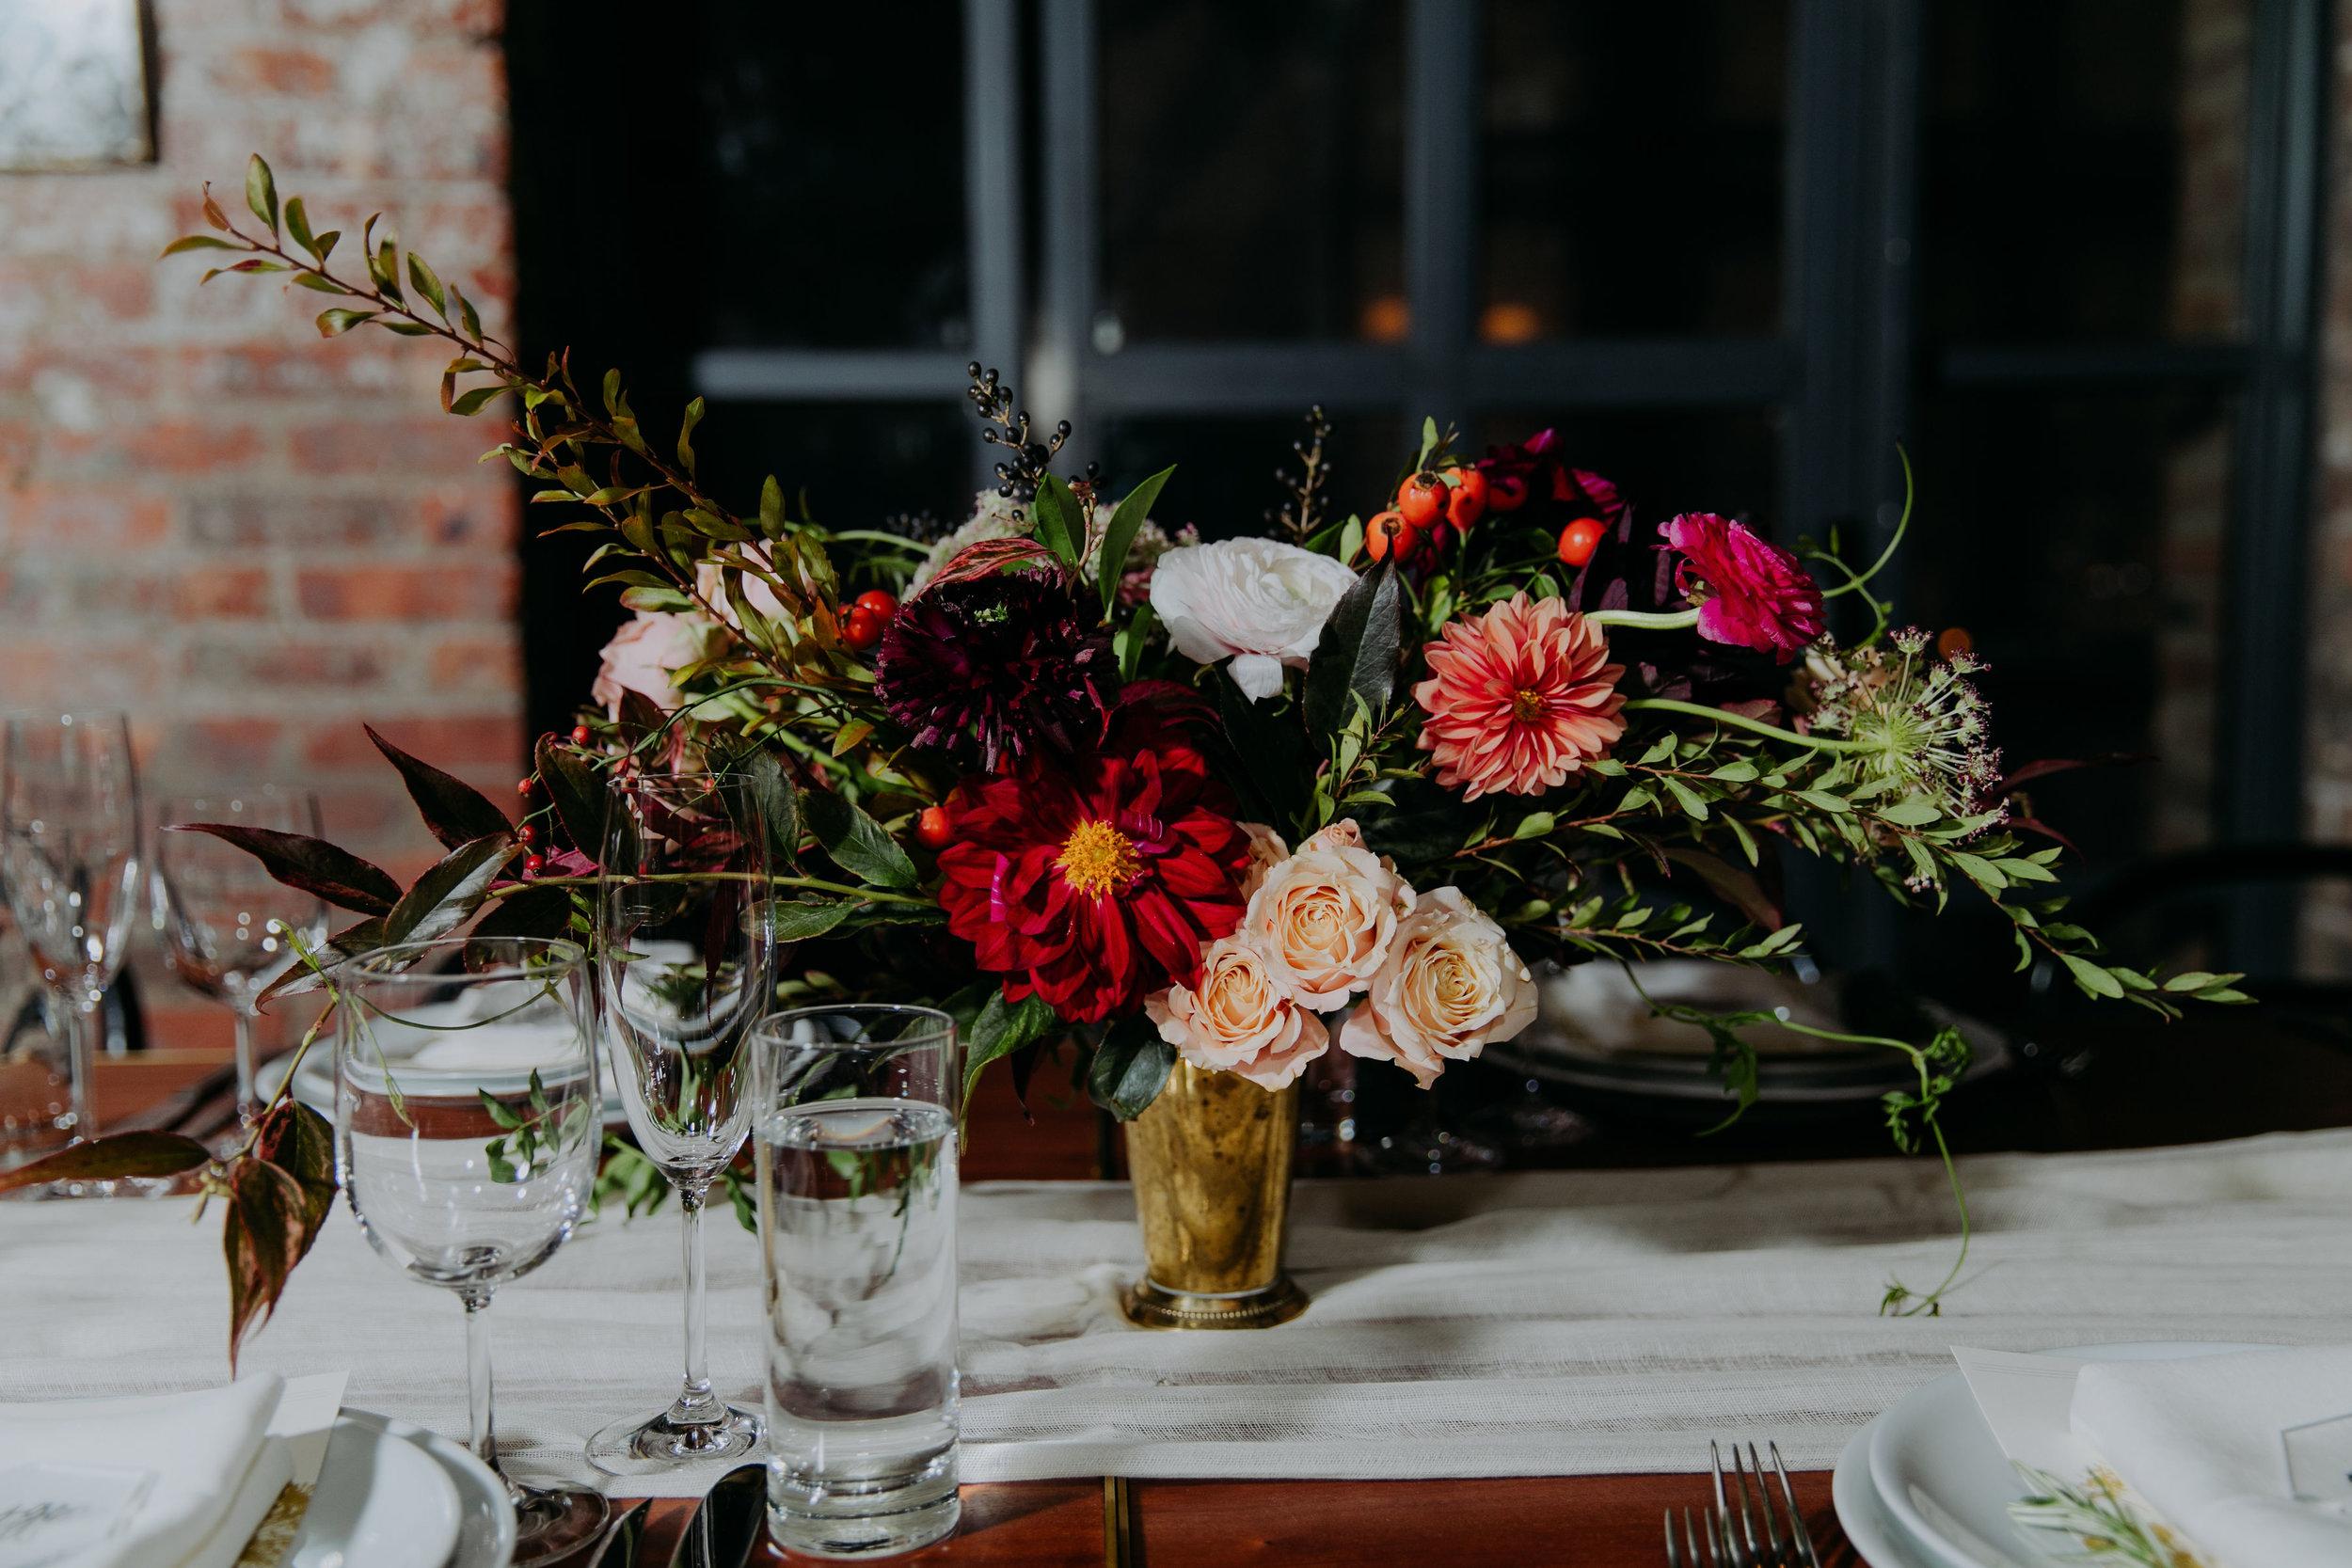 wythe-hotel-wedding-photographer-amber-gress-0473.jpg